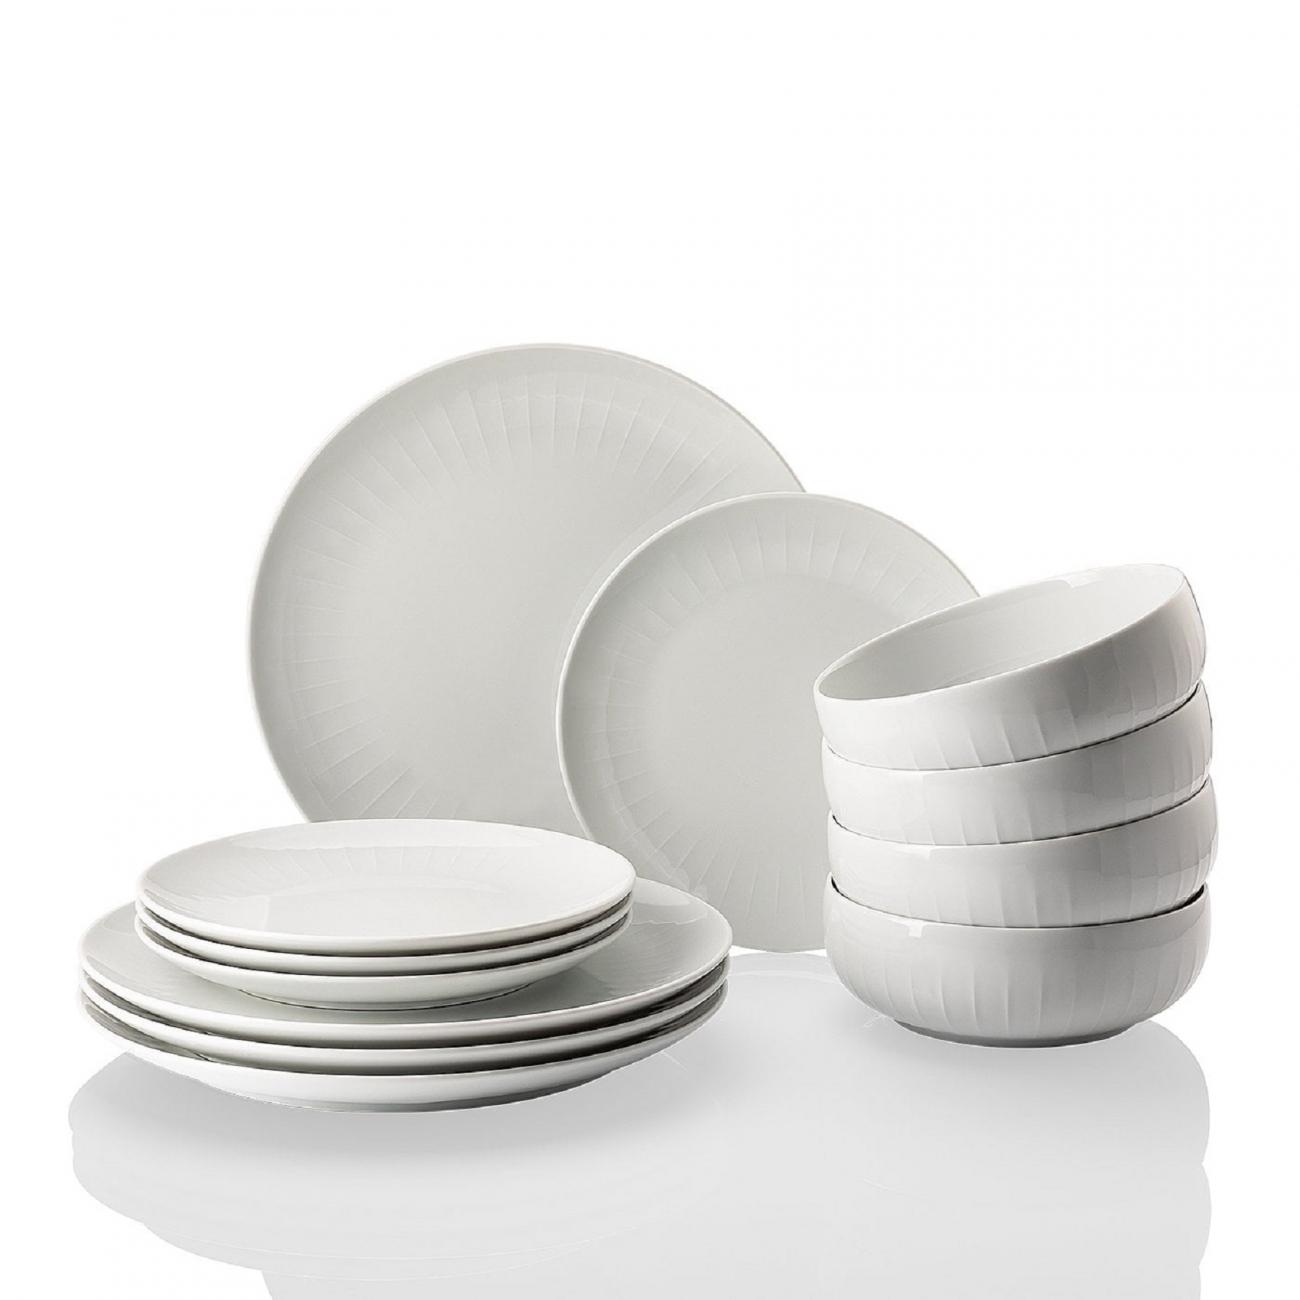 Arzberg Joyn Dinner Set. 12 Pieces